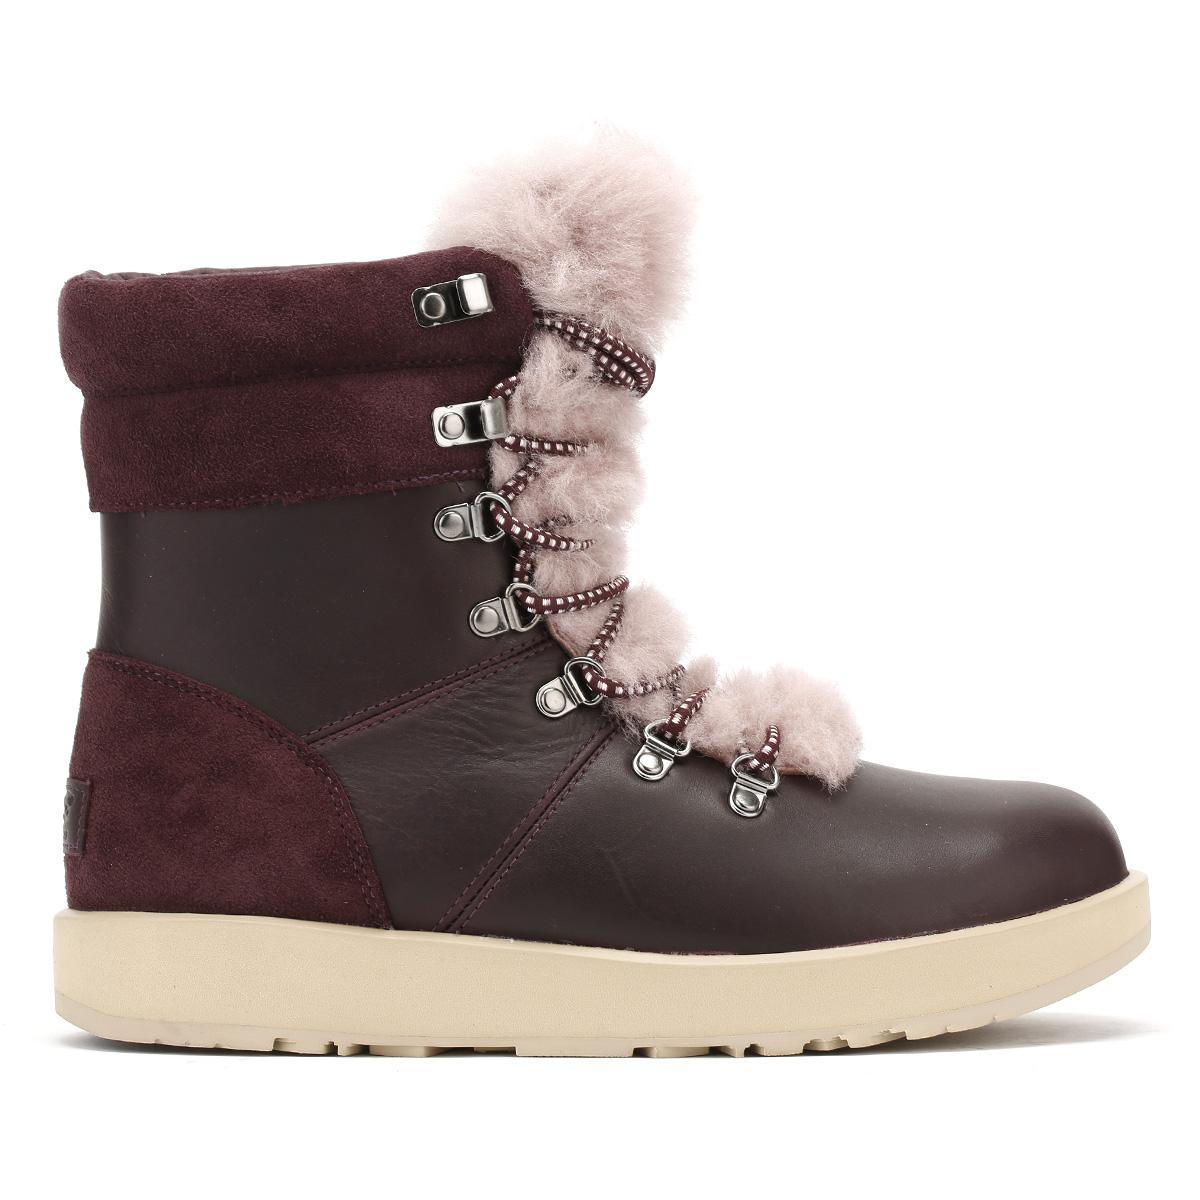 603062656e5 Ugg Multicolor Ugg Womens Port Black Viki Waterproof Boots